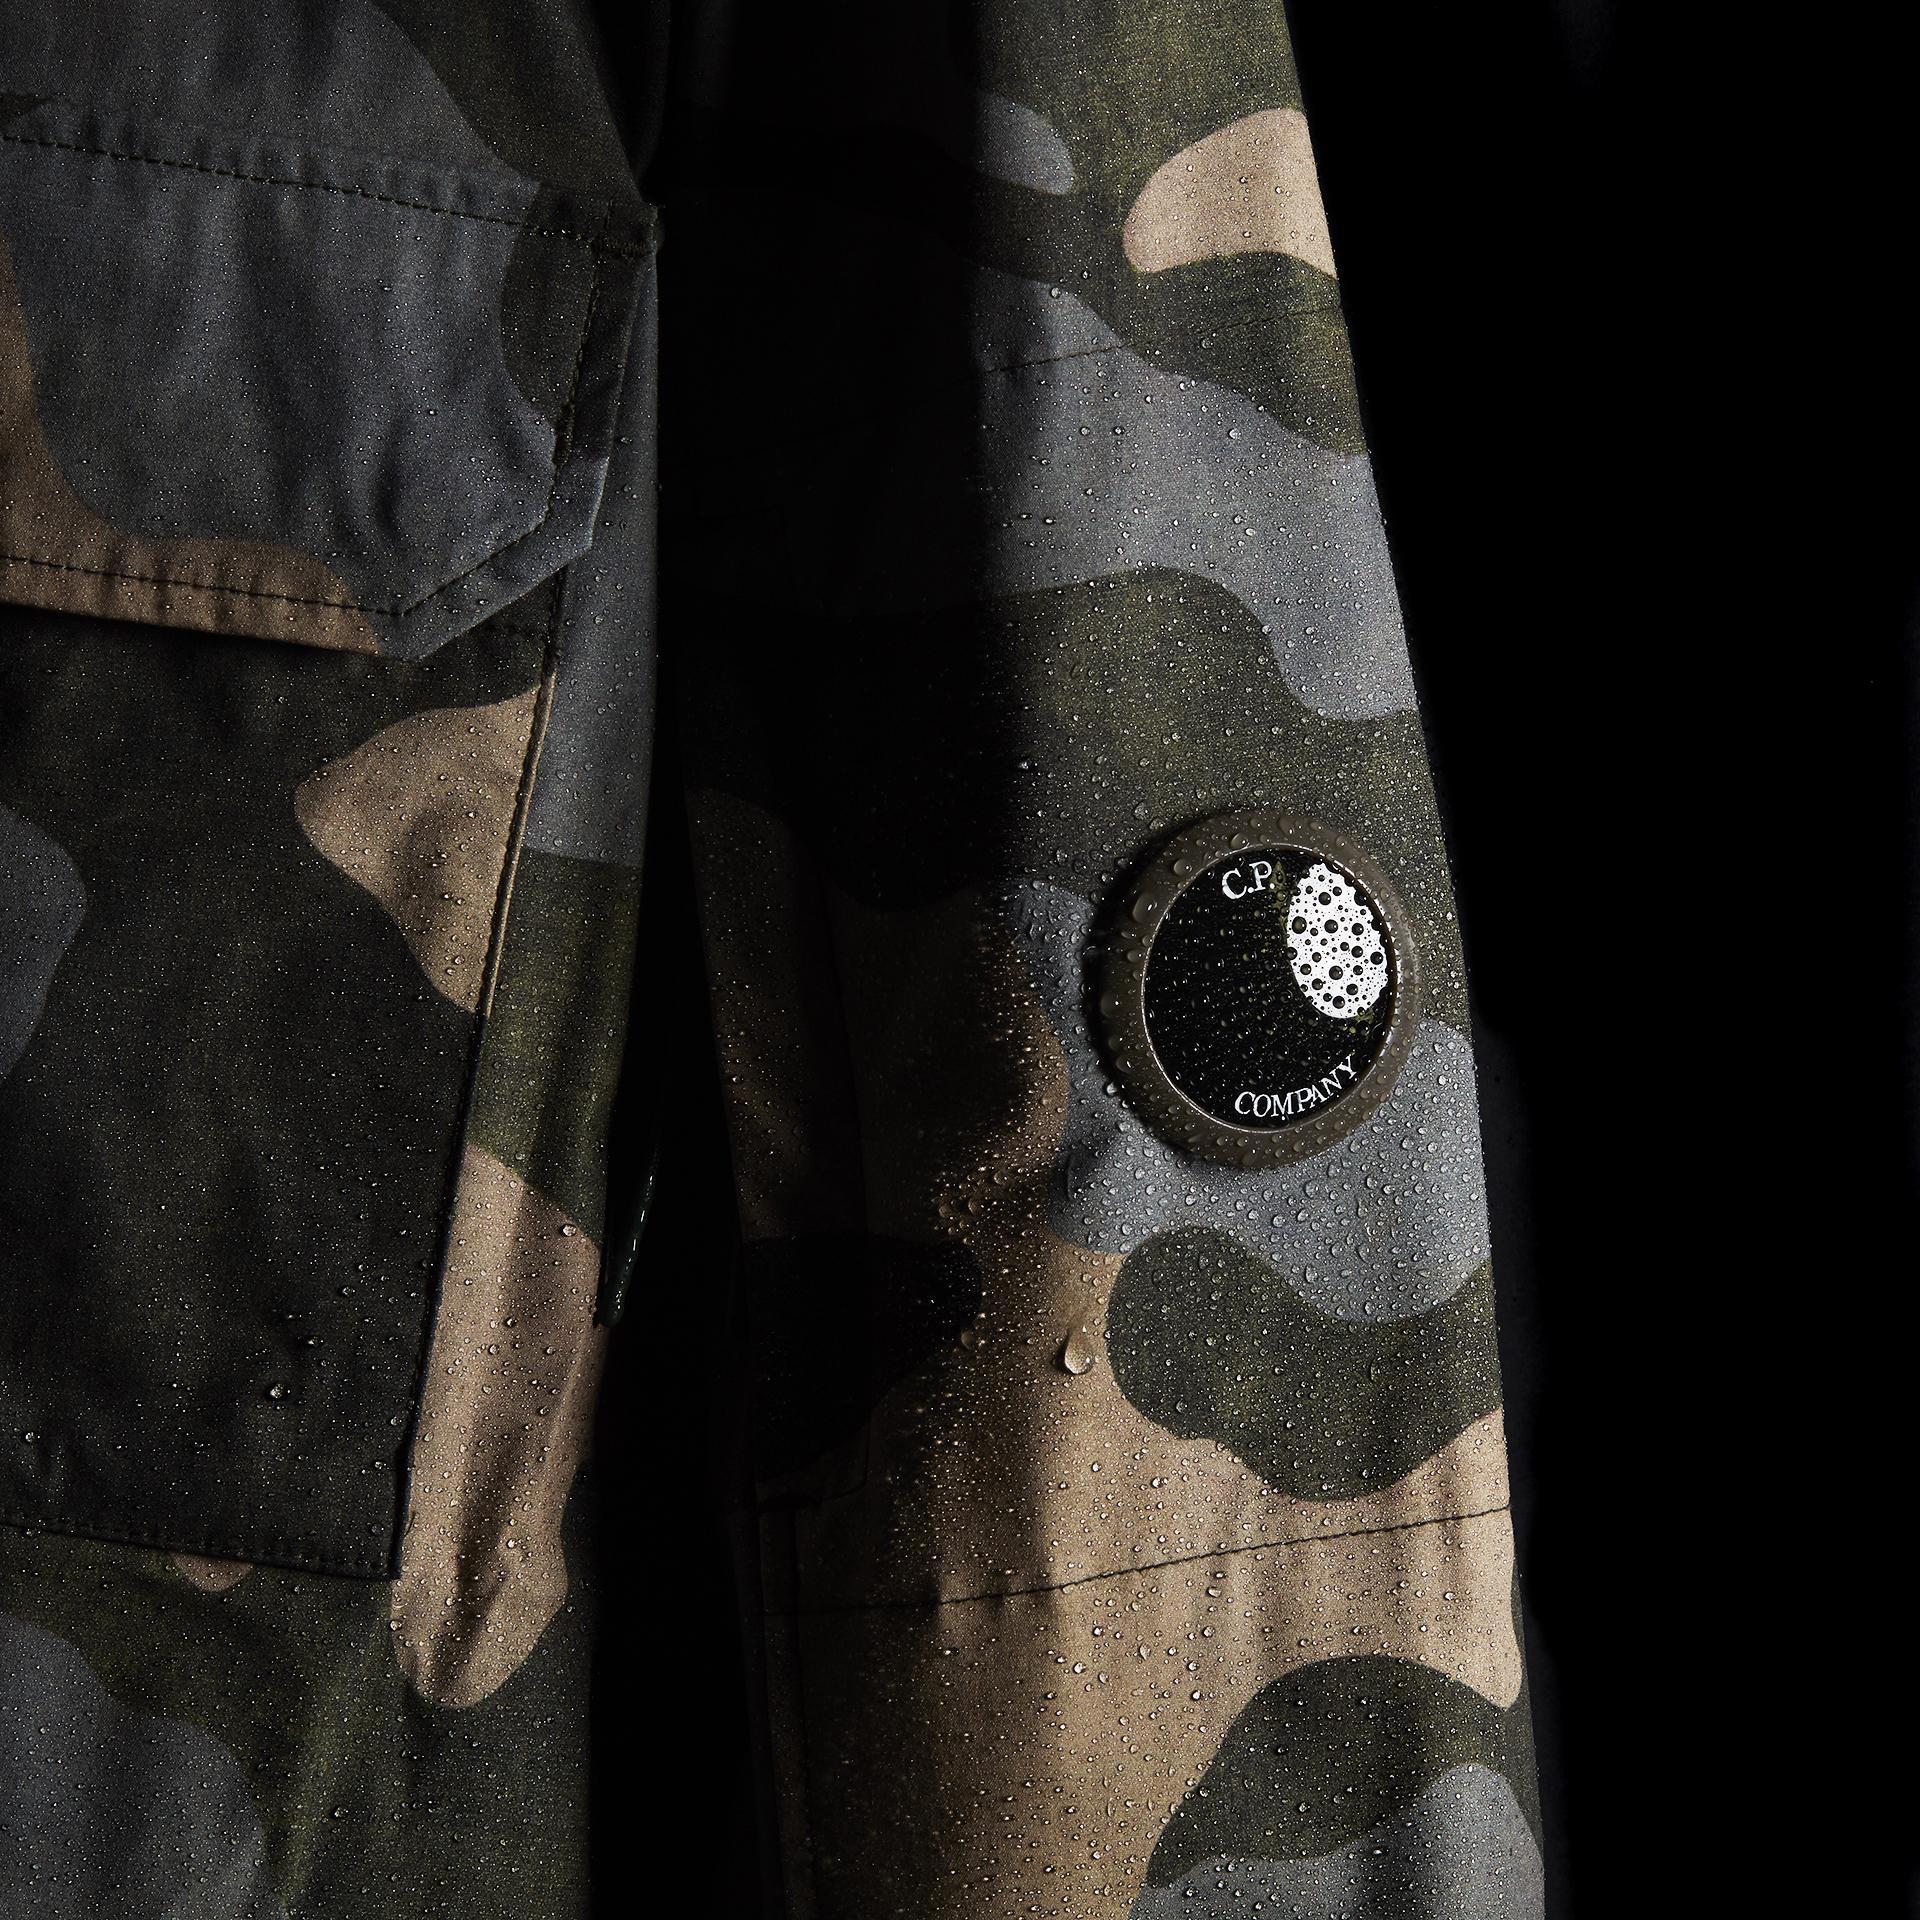 Camo C.P. Company jacket on black side background